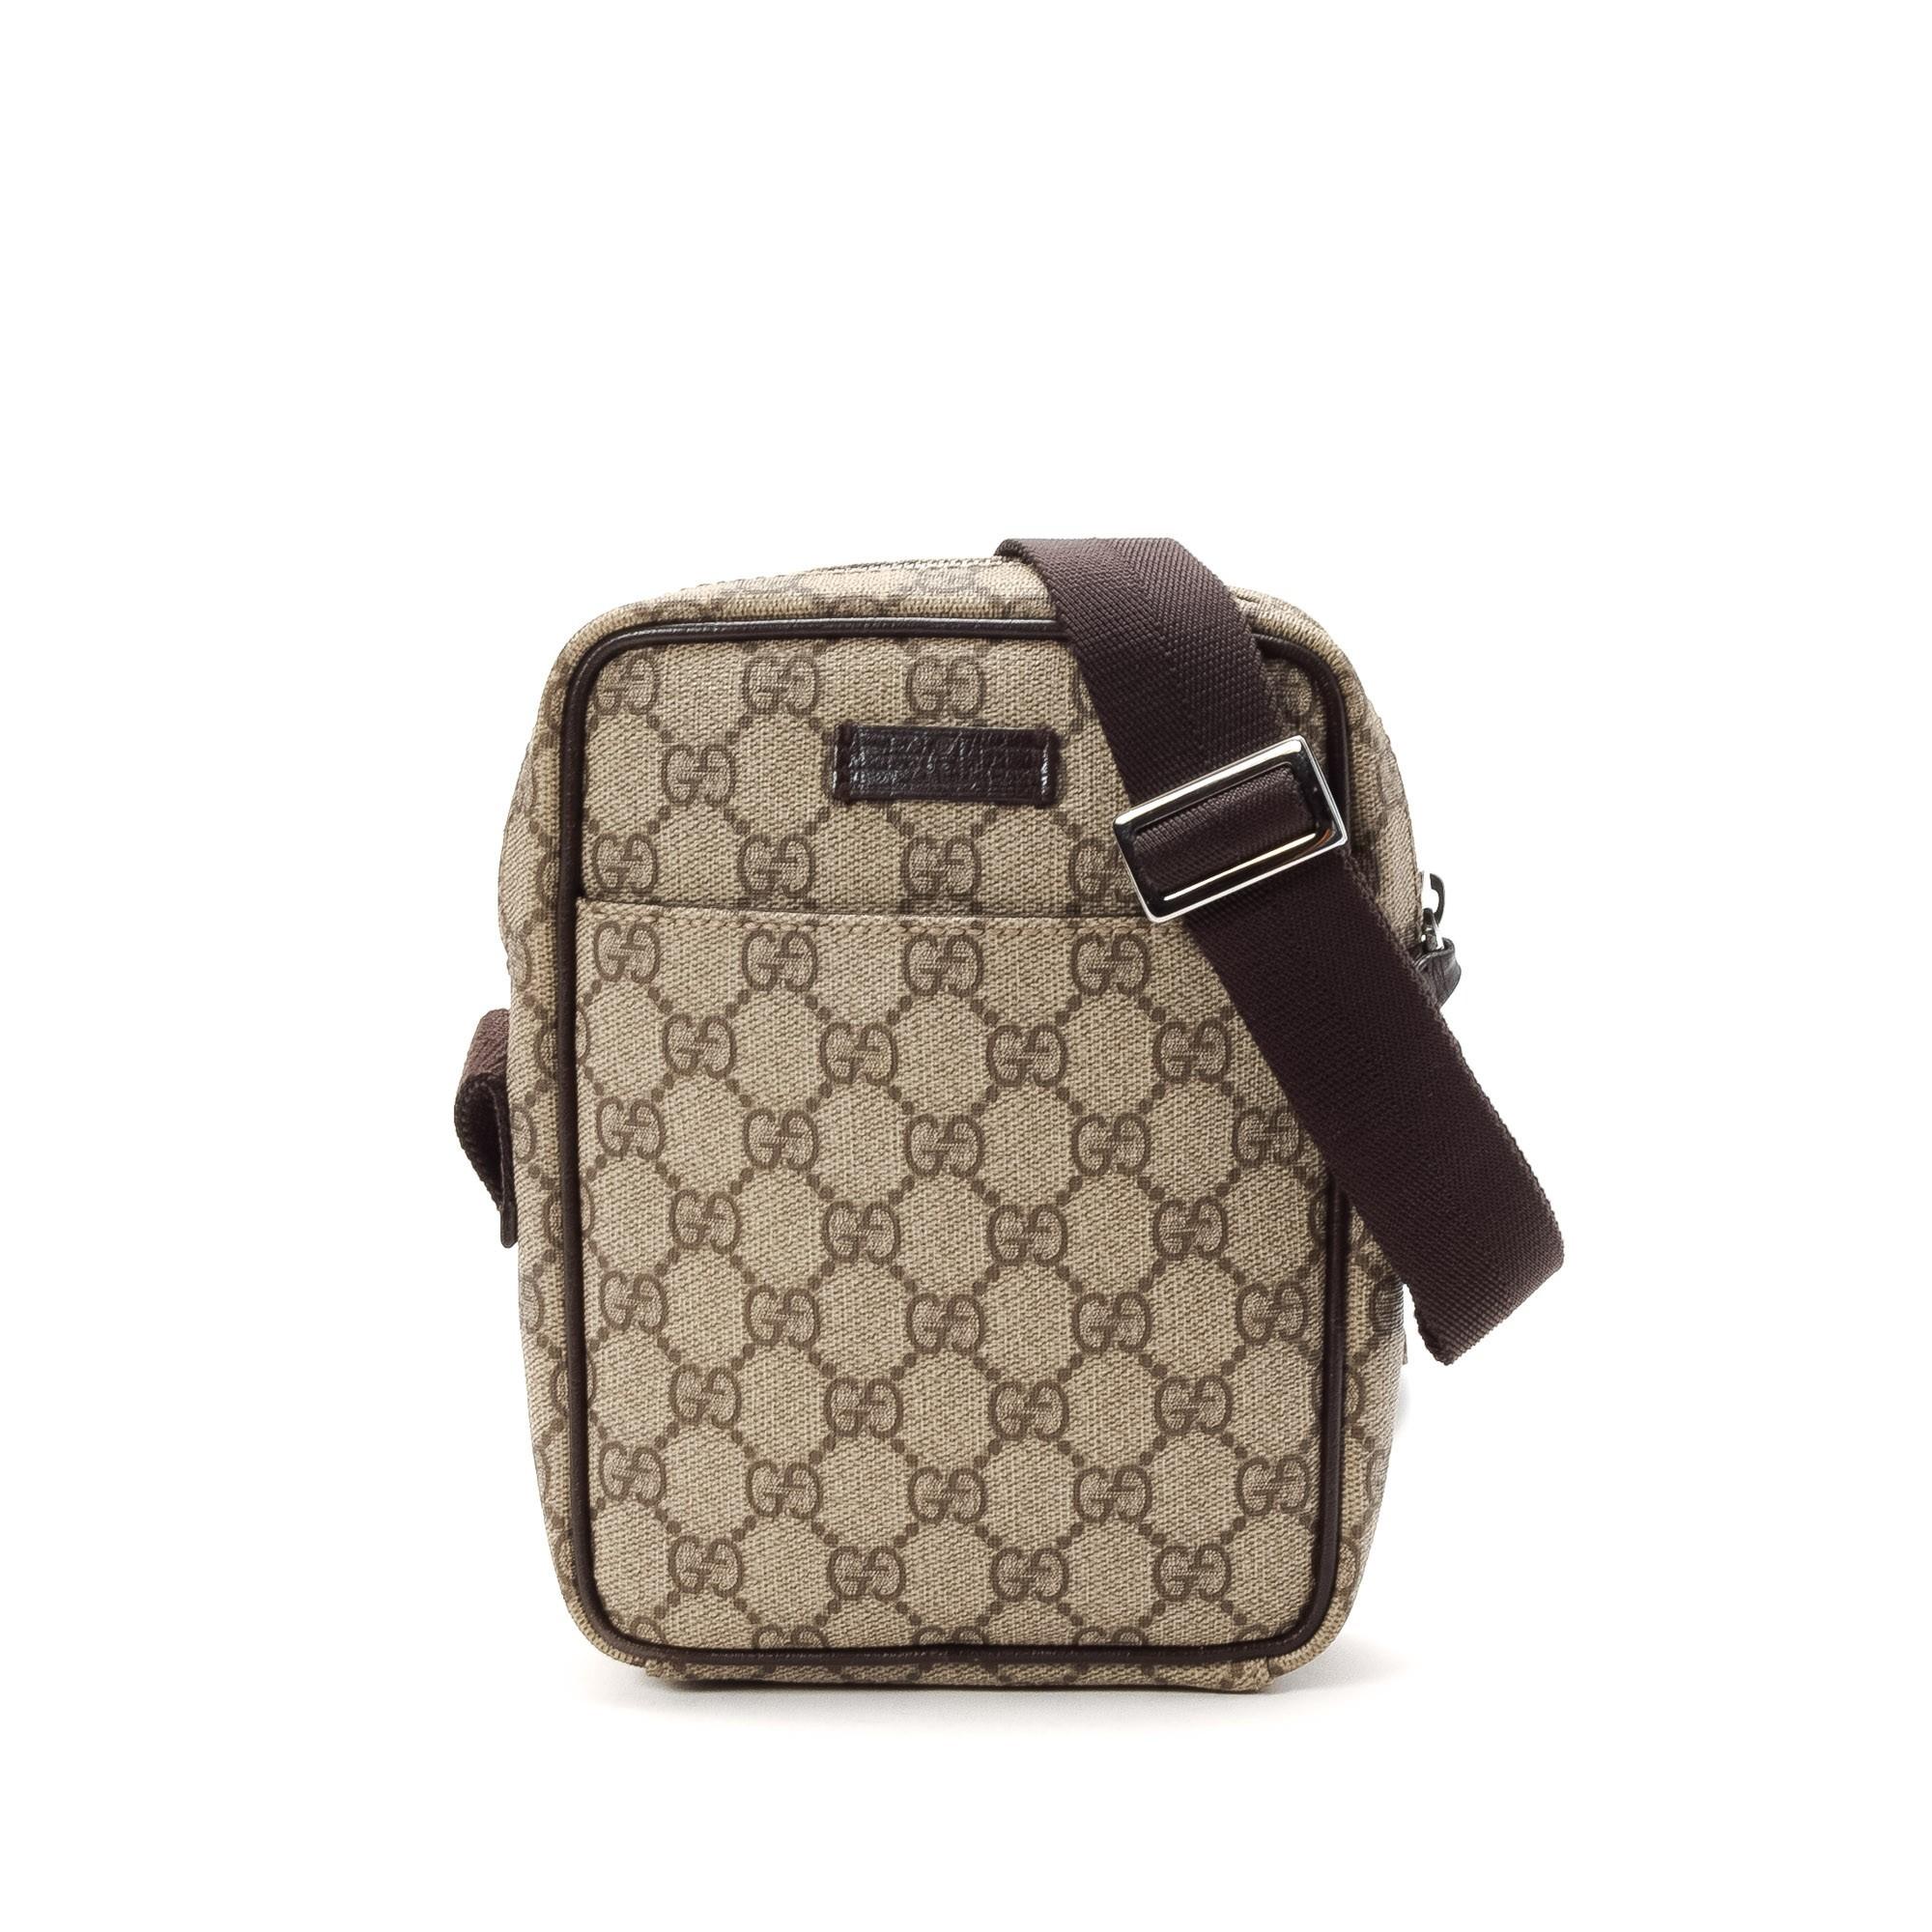 6f9db54fec83 Gucci Messenger Crossbody Handbags | Stanford Center for Opportunity ...